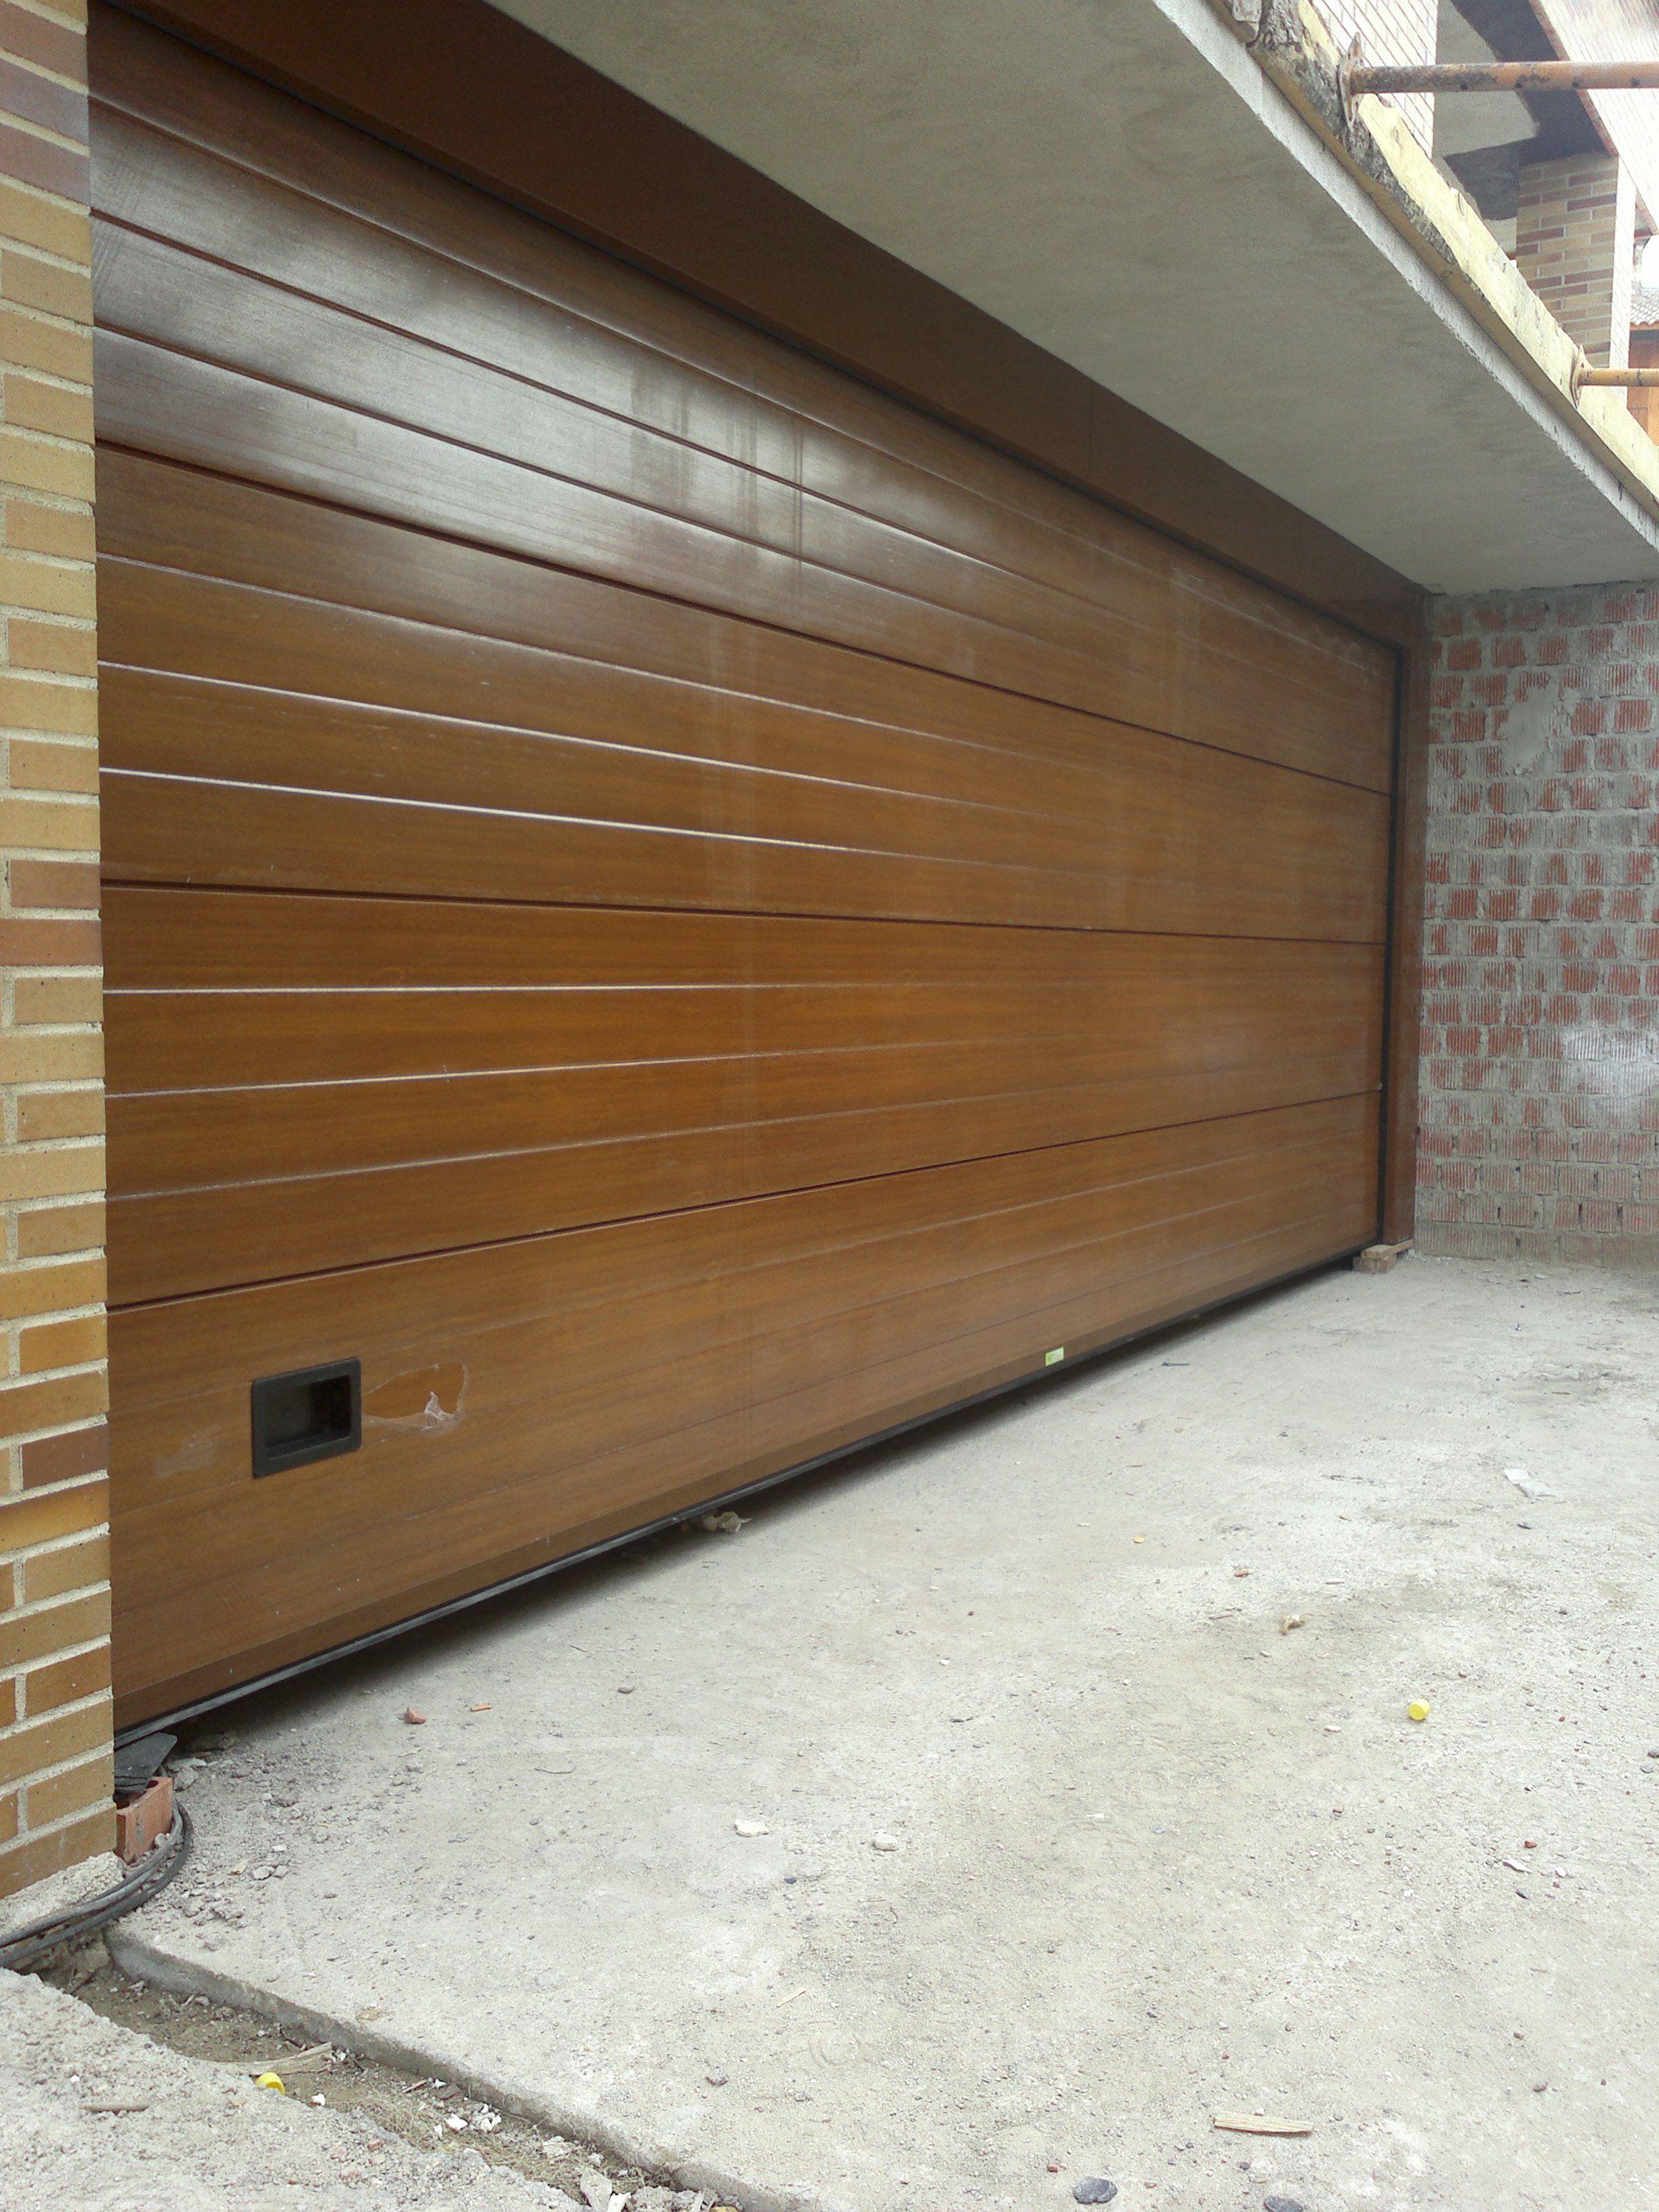 Motor puerta seccional garaje best kit motor pujol stc - Motor puerta garaje precio ...